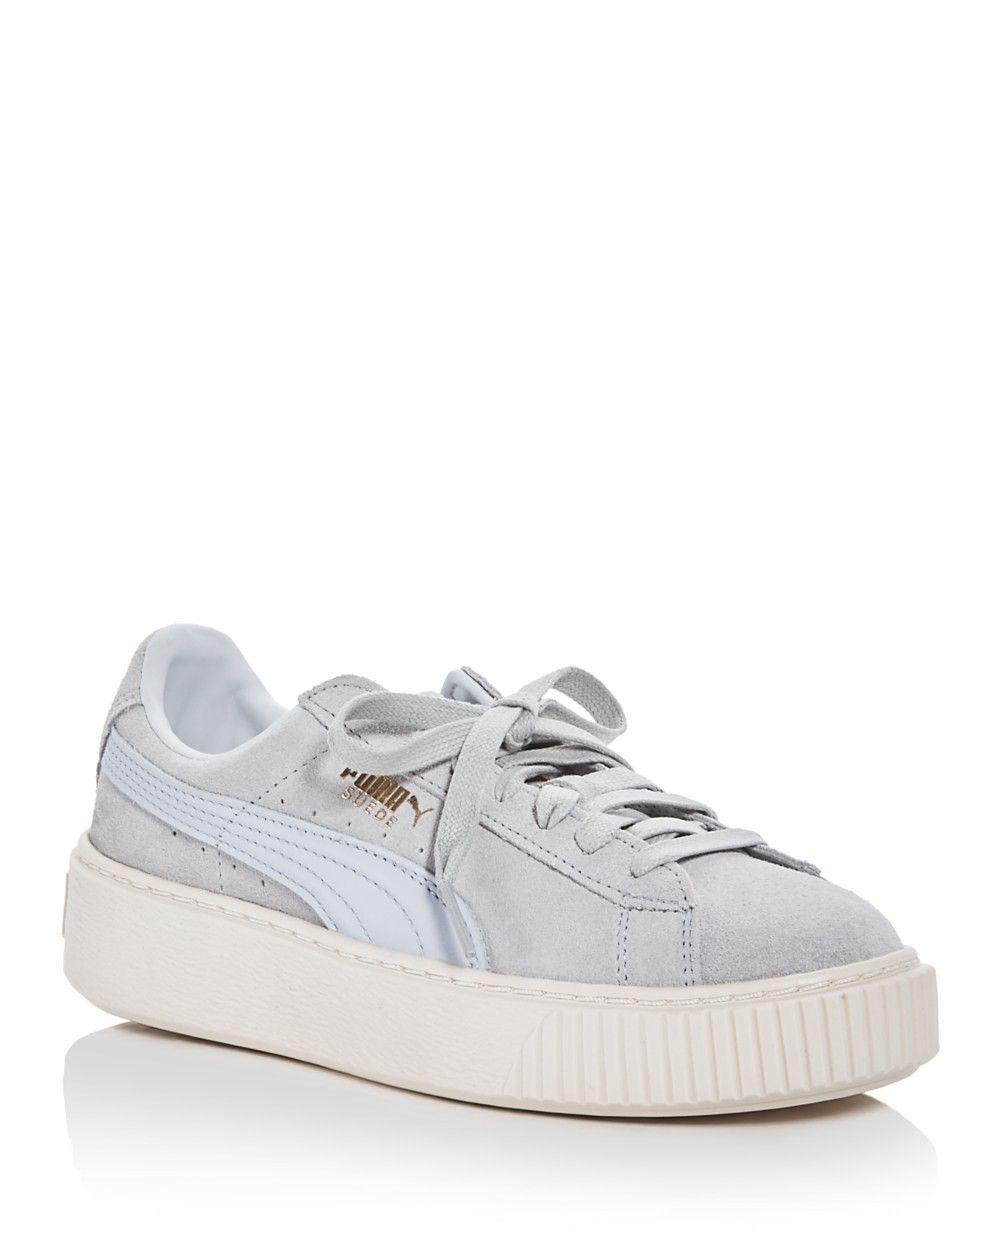 los angeles 6653d 75ed4 PUMA PUMA Women s Core Lace Up Platform Sneakers.  puma  shoes  all